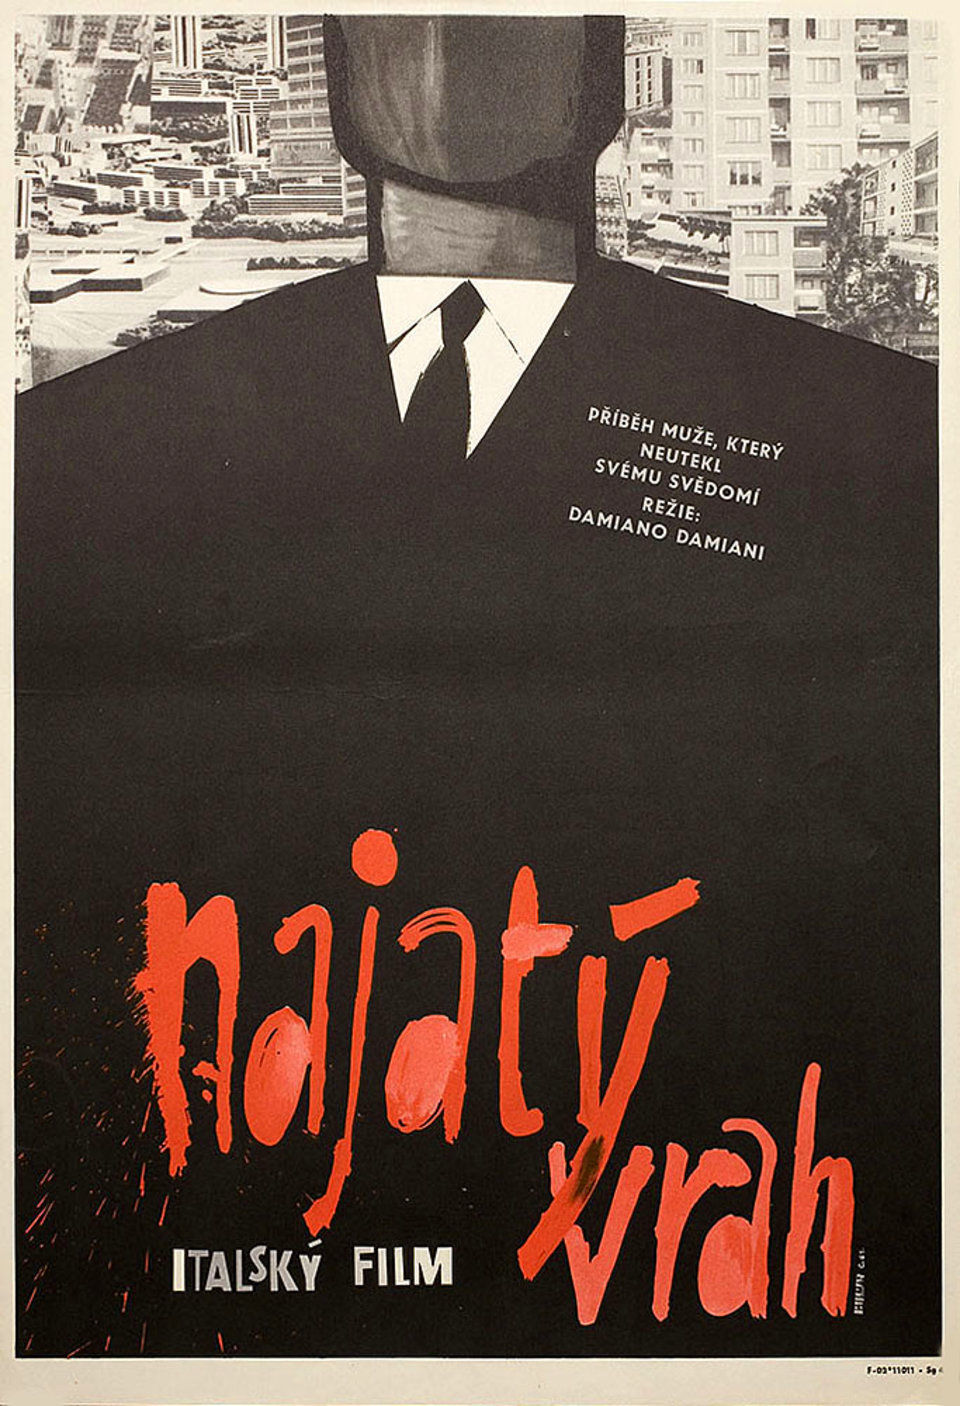 blood-feud-1962-original-czech-movie-poster